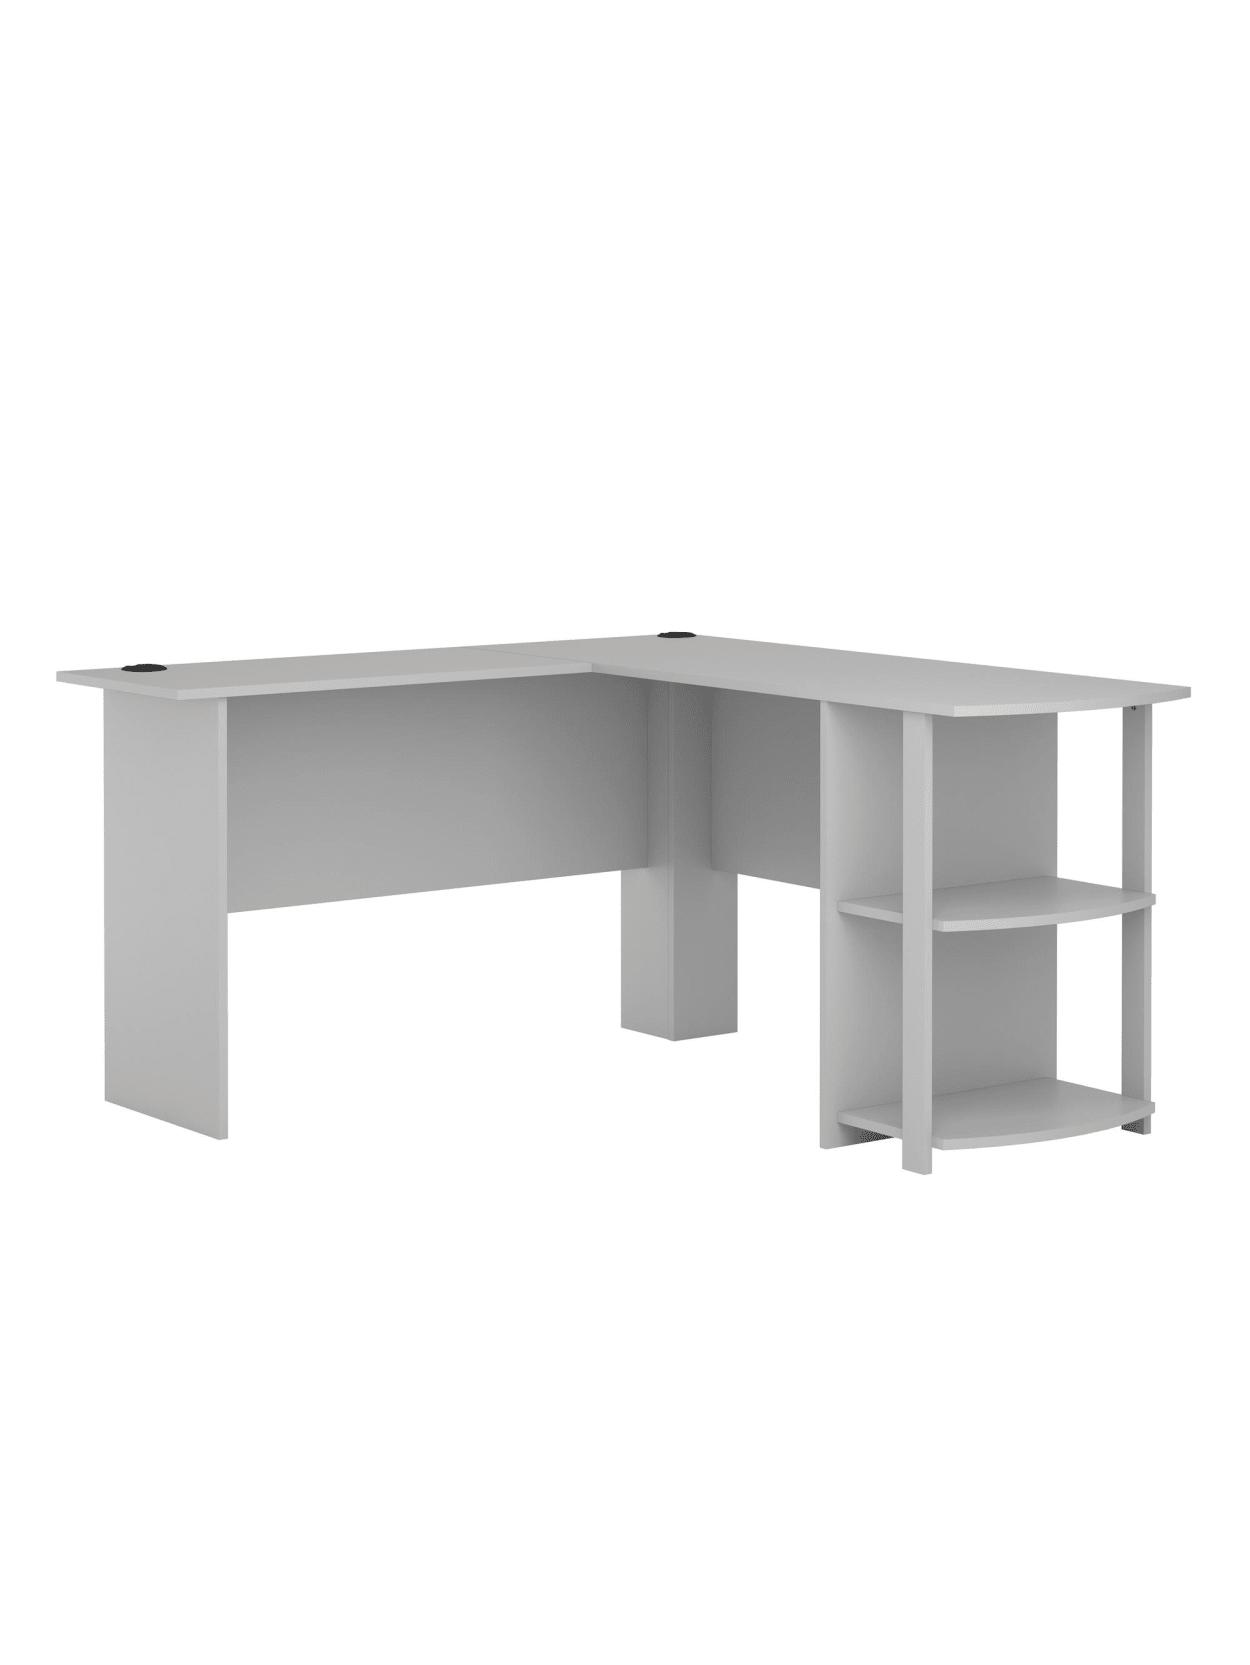 Ameriwood Home Dakota L Shaped Desk With Bookshelves Dove Gray Office Depot